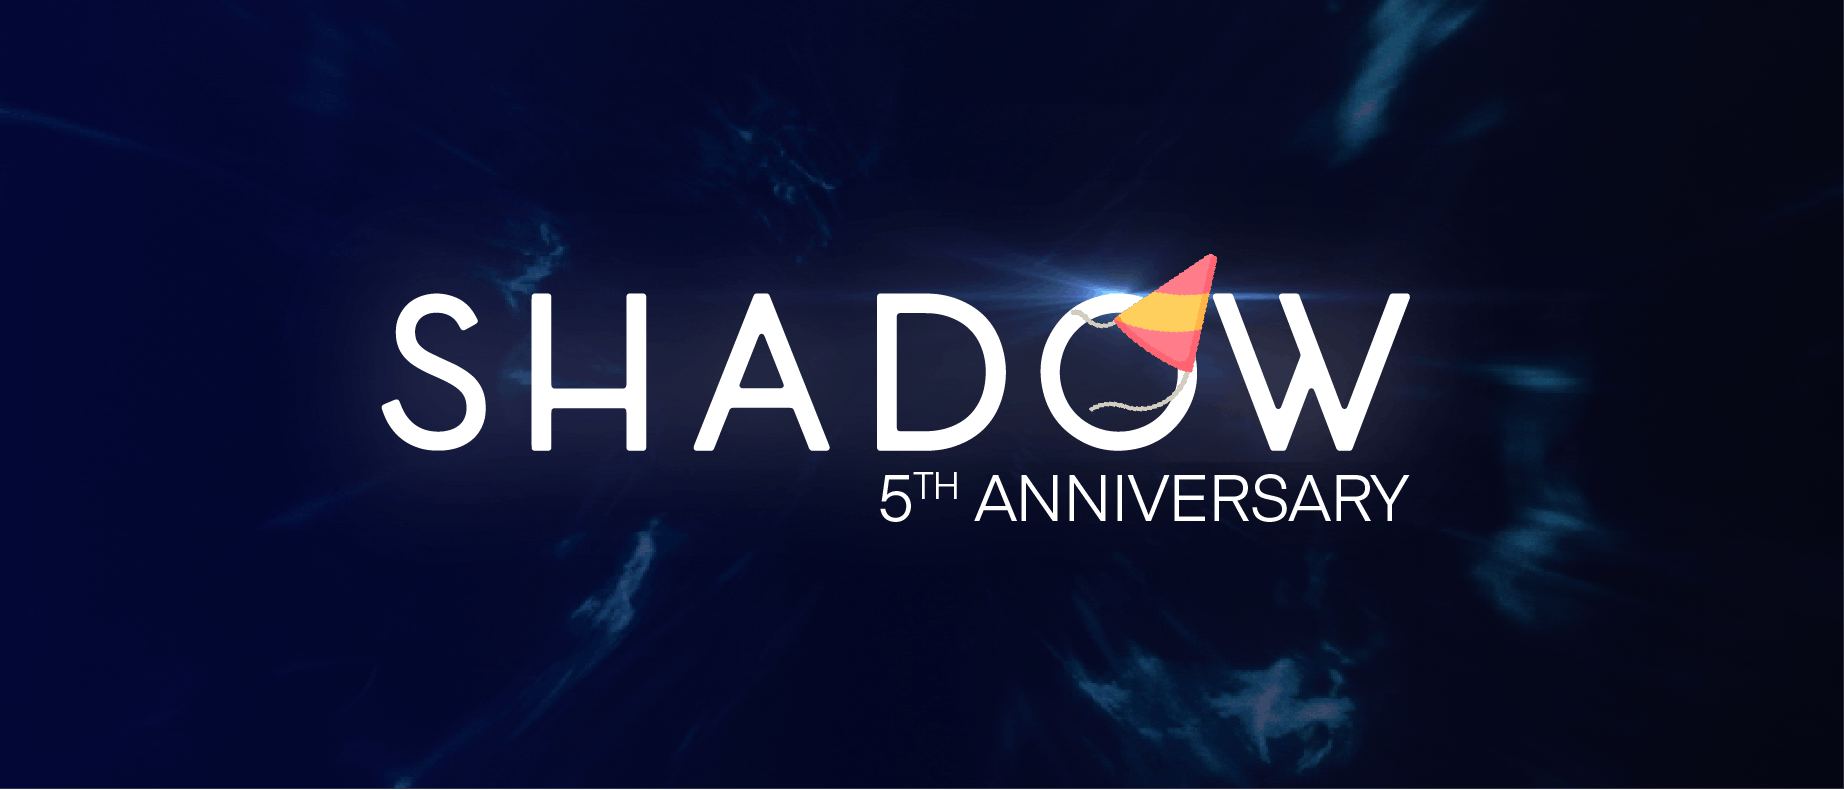 Joyeux Shadow-versaire !